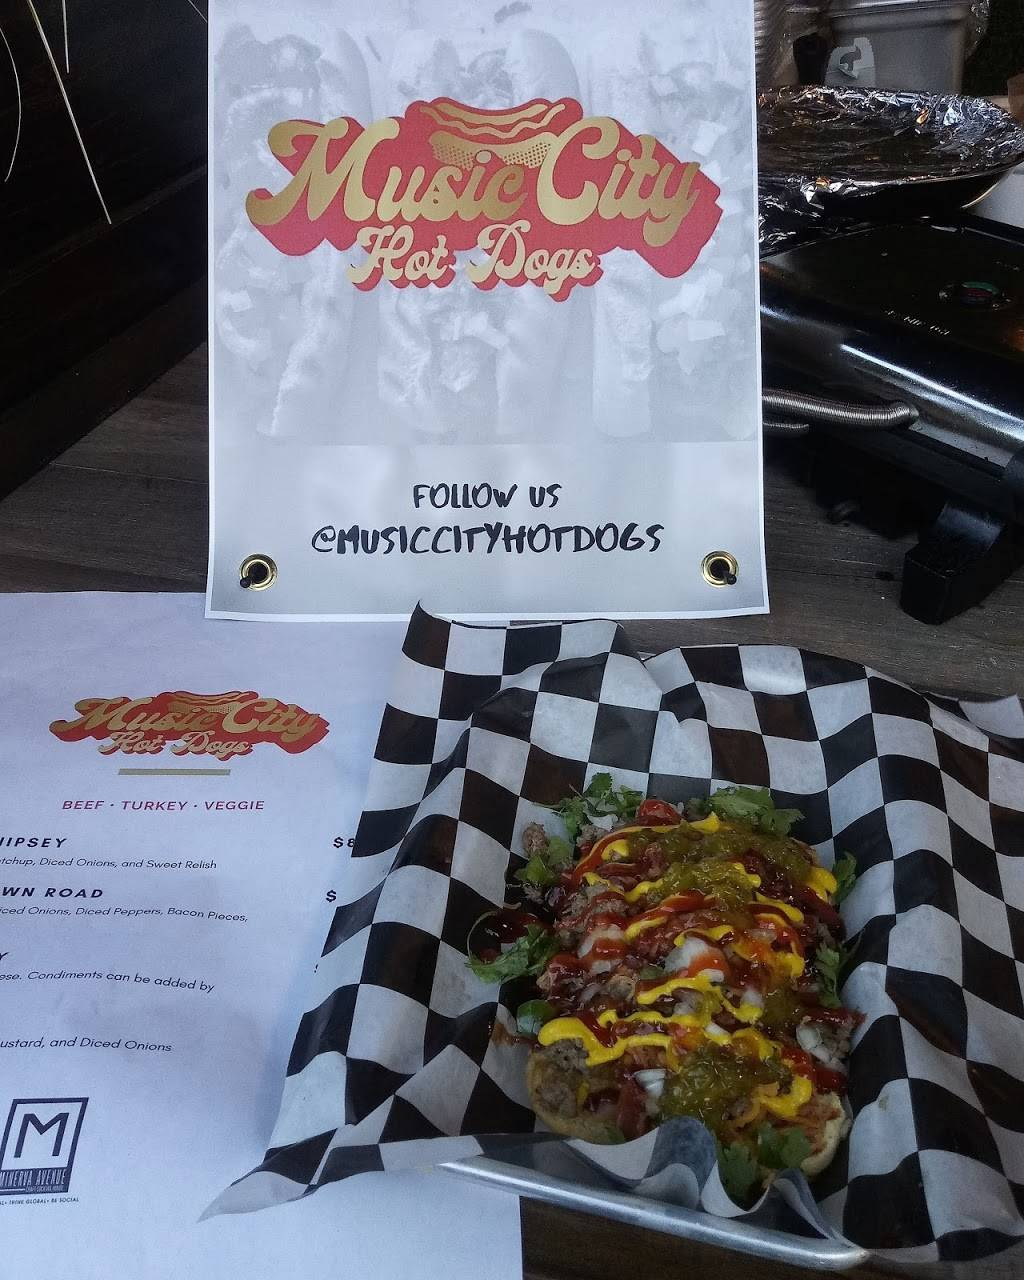 Music City Hot Dogs - restaurant  | Photo 1 of 1 | Address: 1002 Buchanan St, Nashville, TN 37208, USA | Phone: (615) 663-0769